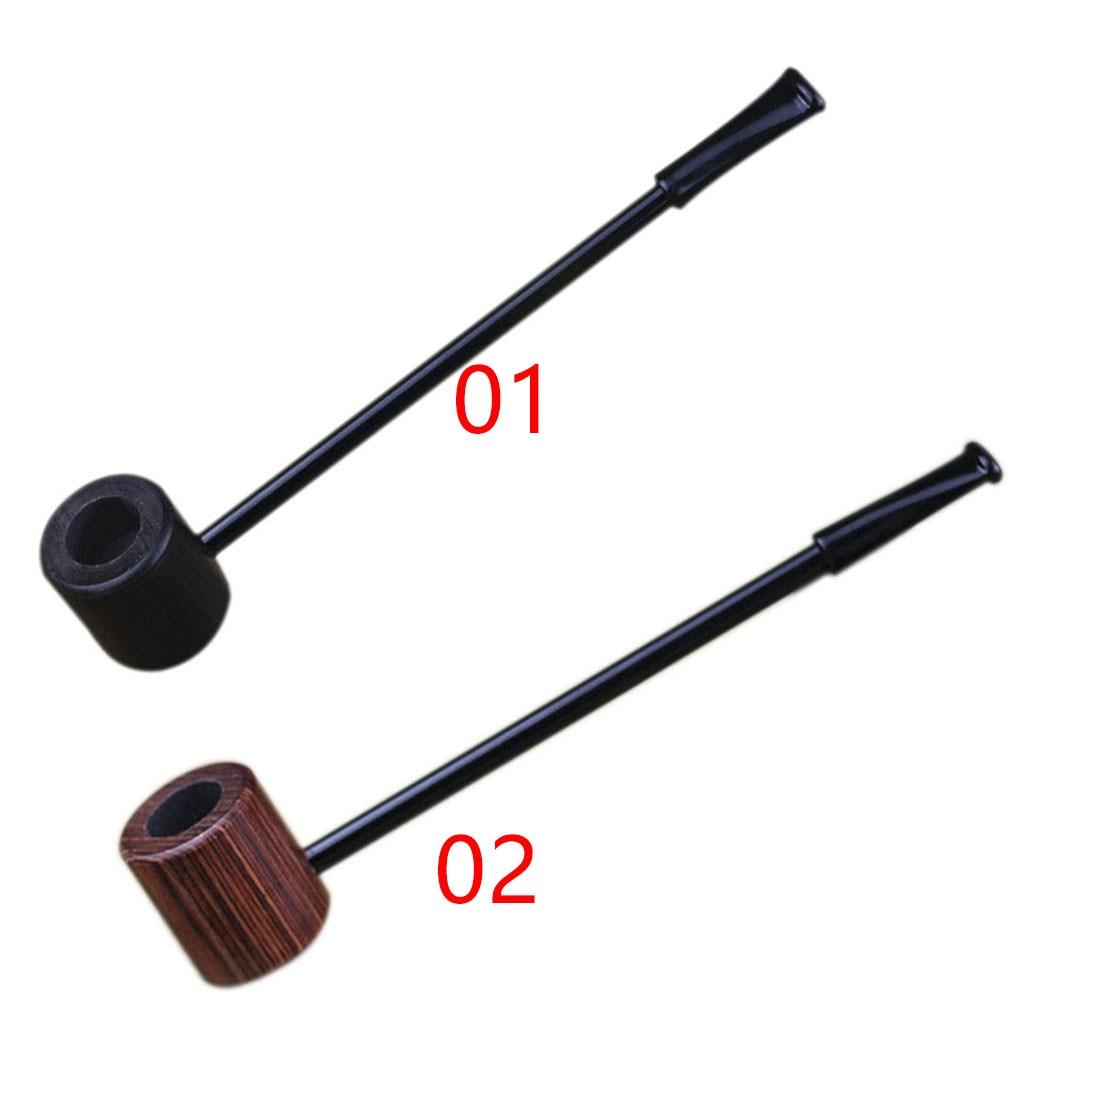 Grade Ebony Wood Pipe Smoking Pipes Popeye Portable Creative Smoking Pipe Herb Tobacco Pipes Gifts Weed Grinder Smoke